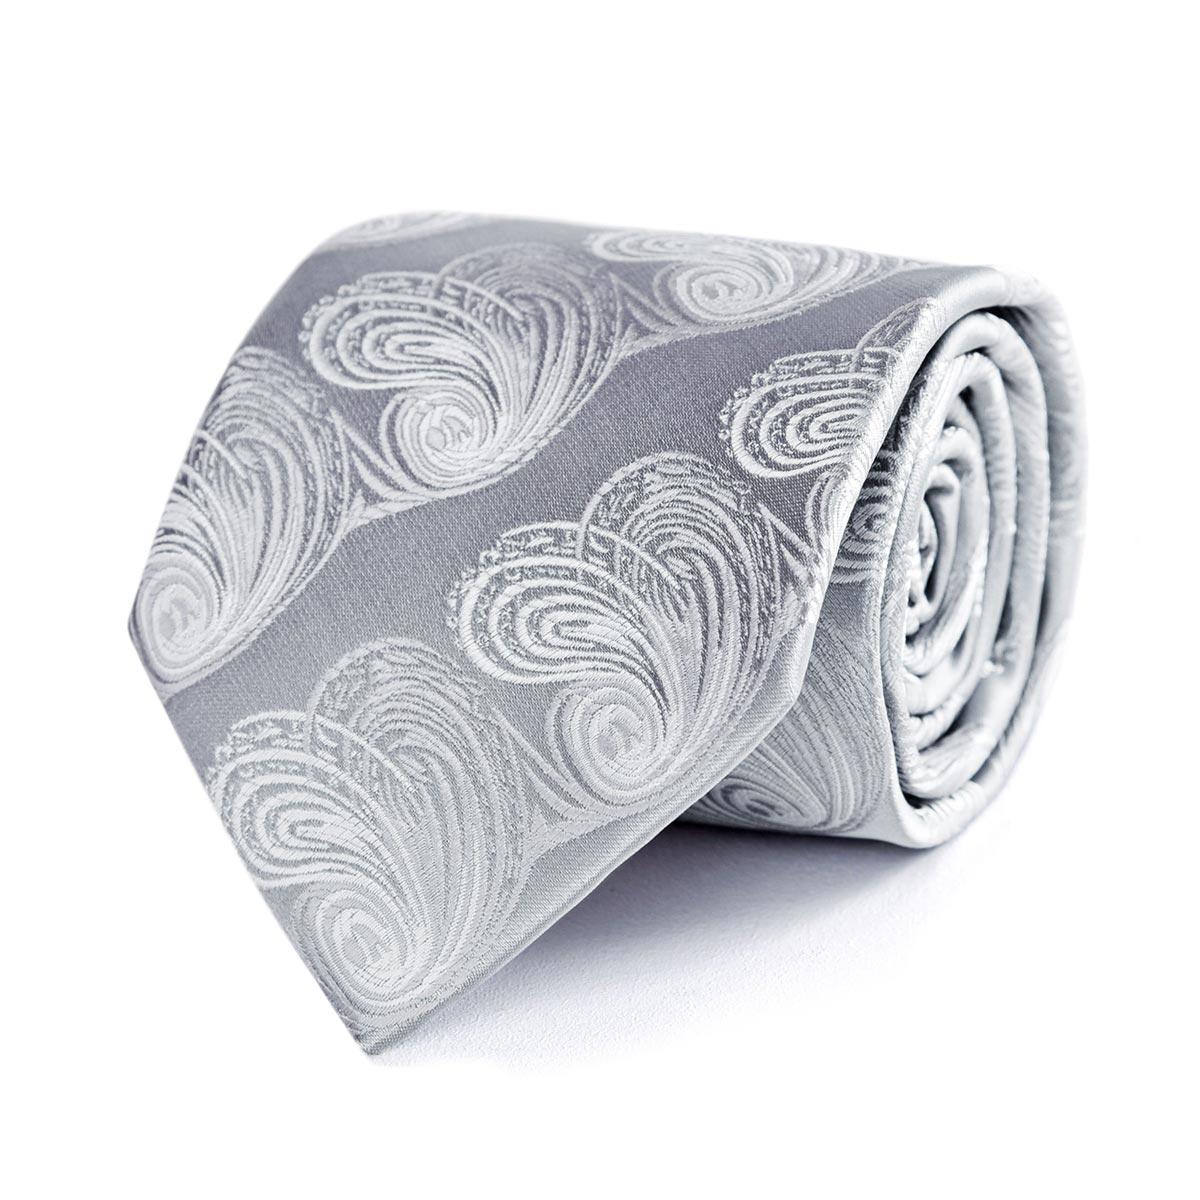 _Cravate-grise-feuille-relief